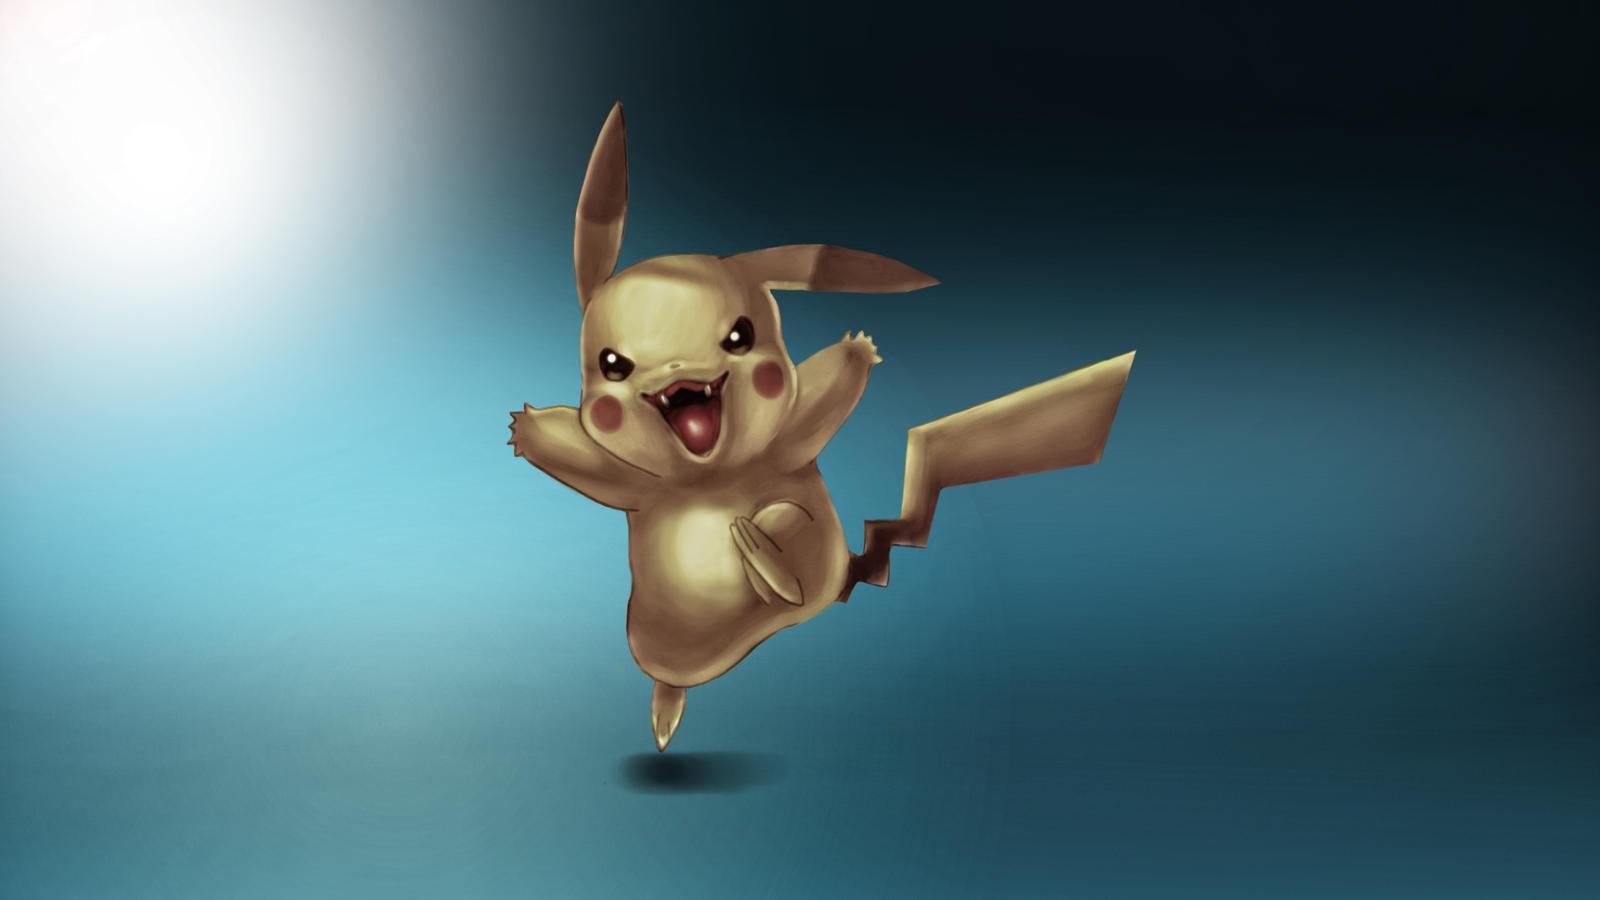 evil pikachu wallpaper - photo #2